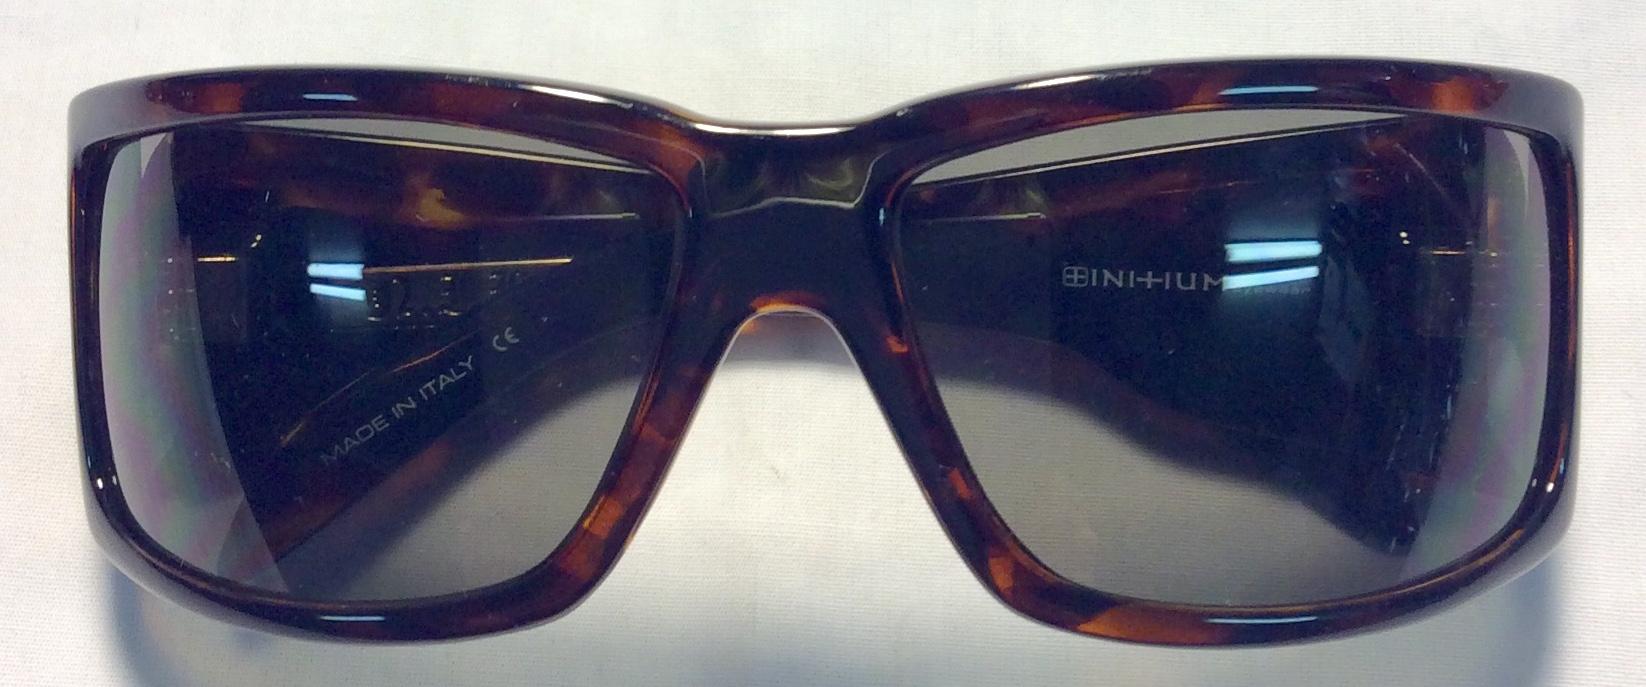 Initium Large leapord print frames